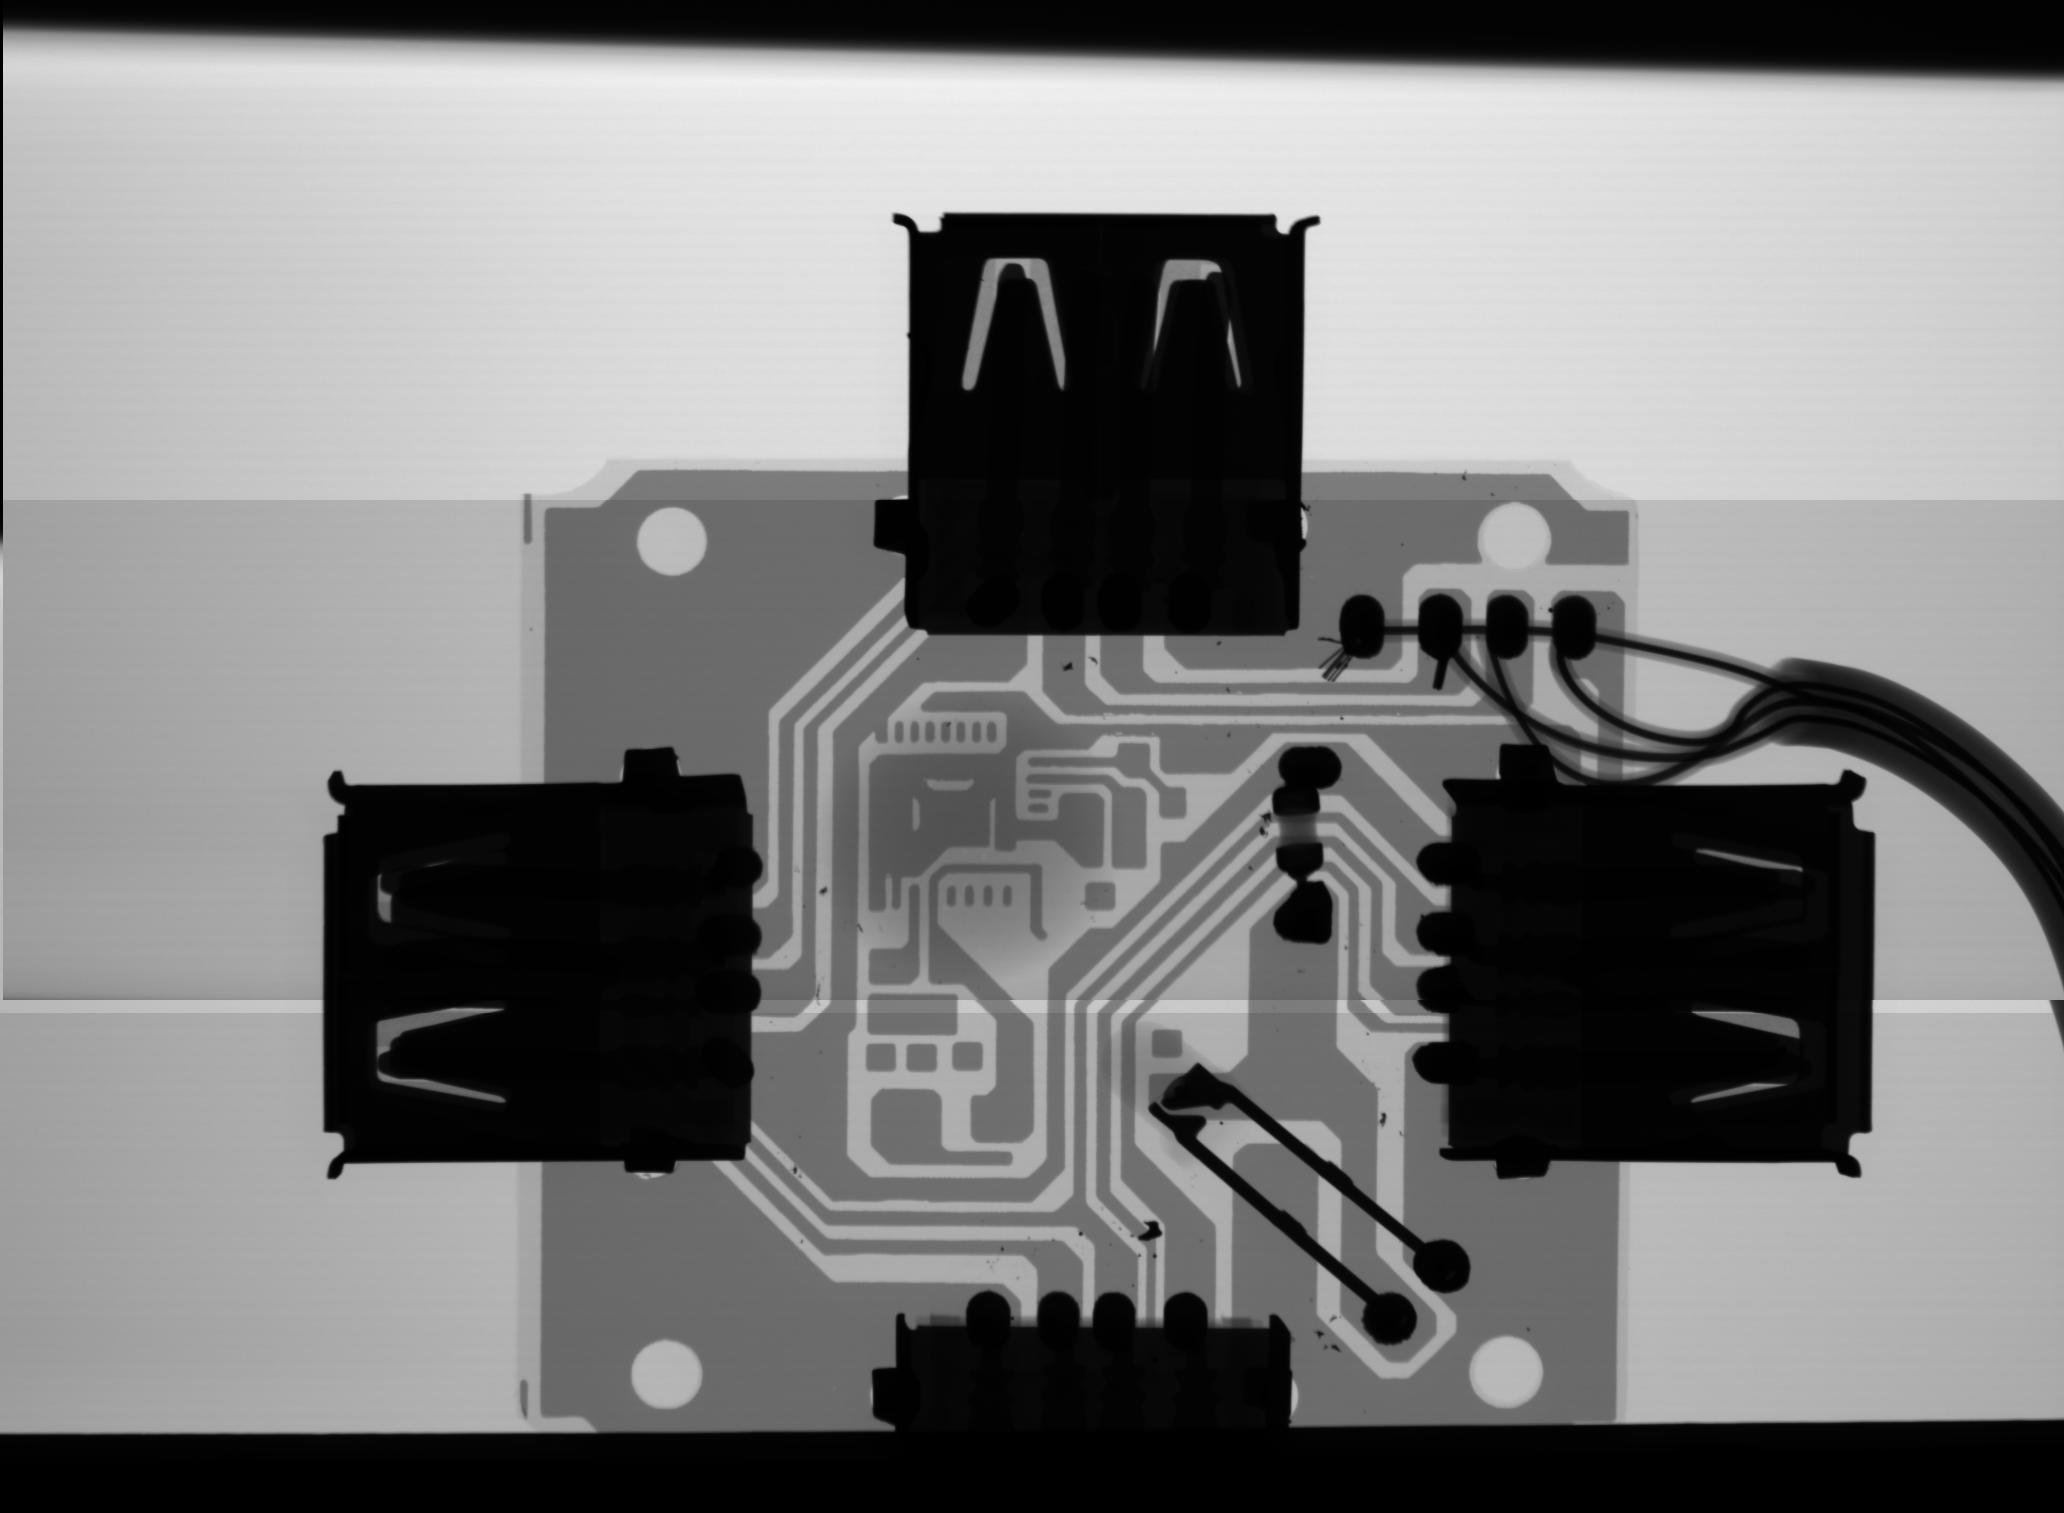 CCY-01 USB hub